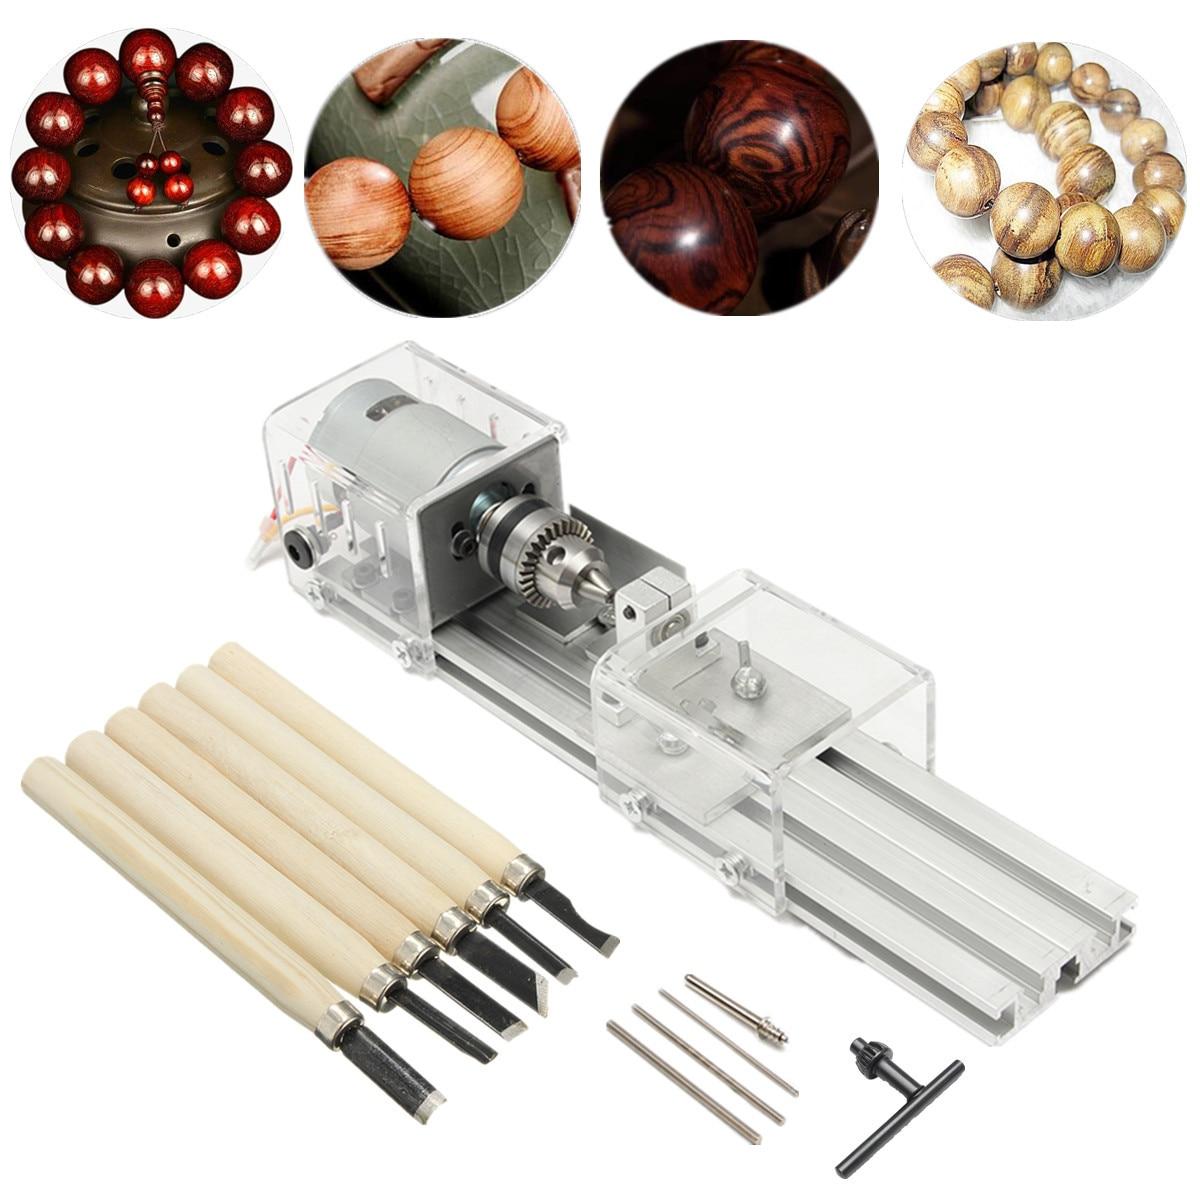 24V 100W DIY Lathe Machine Miniature Lathe Beads Polisher Machine Buddha Pearl Lathe Grinding and Polishing Beads Wood Working цены